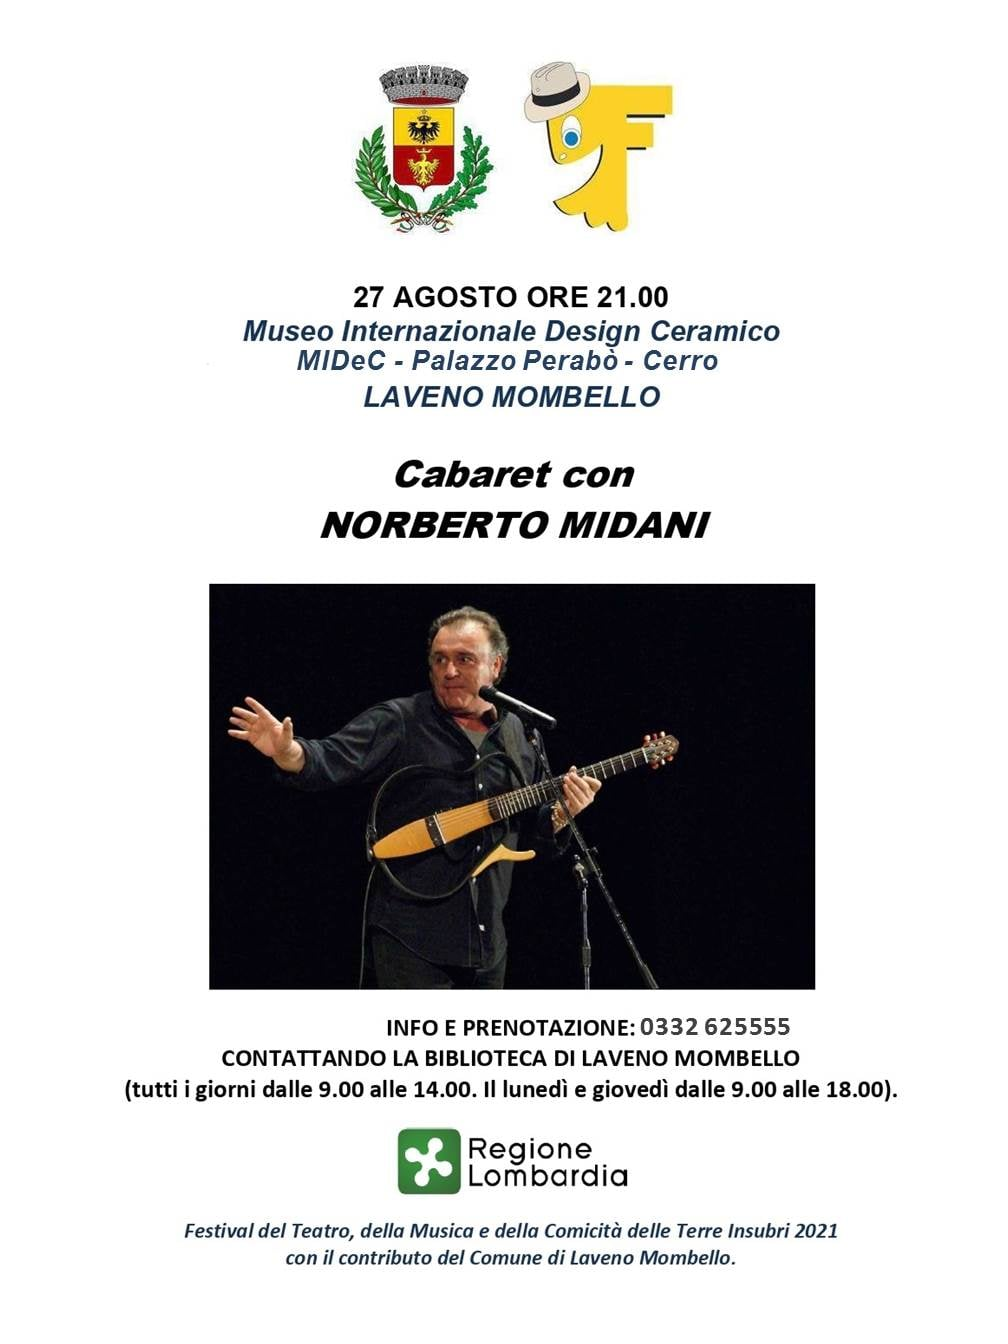 Roberto Midani